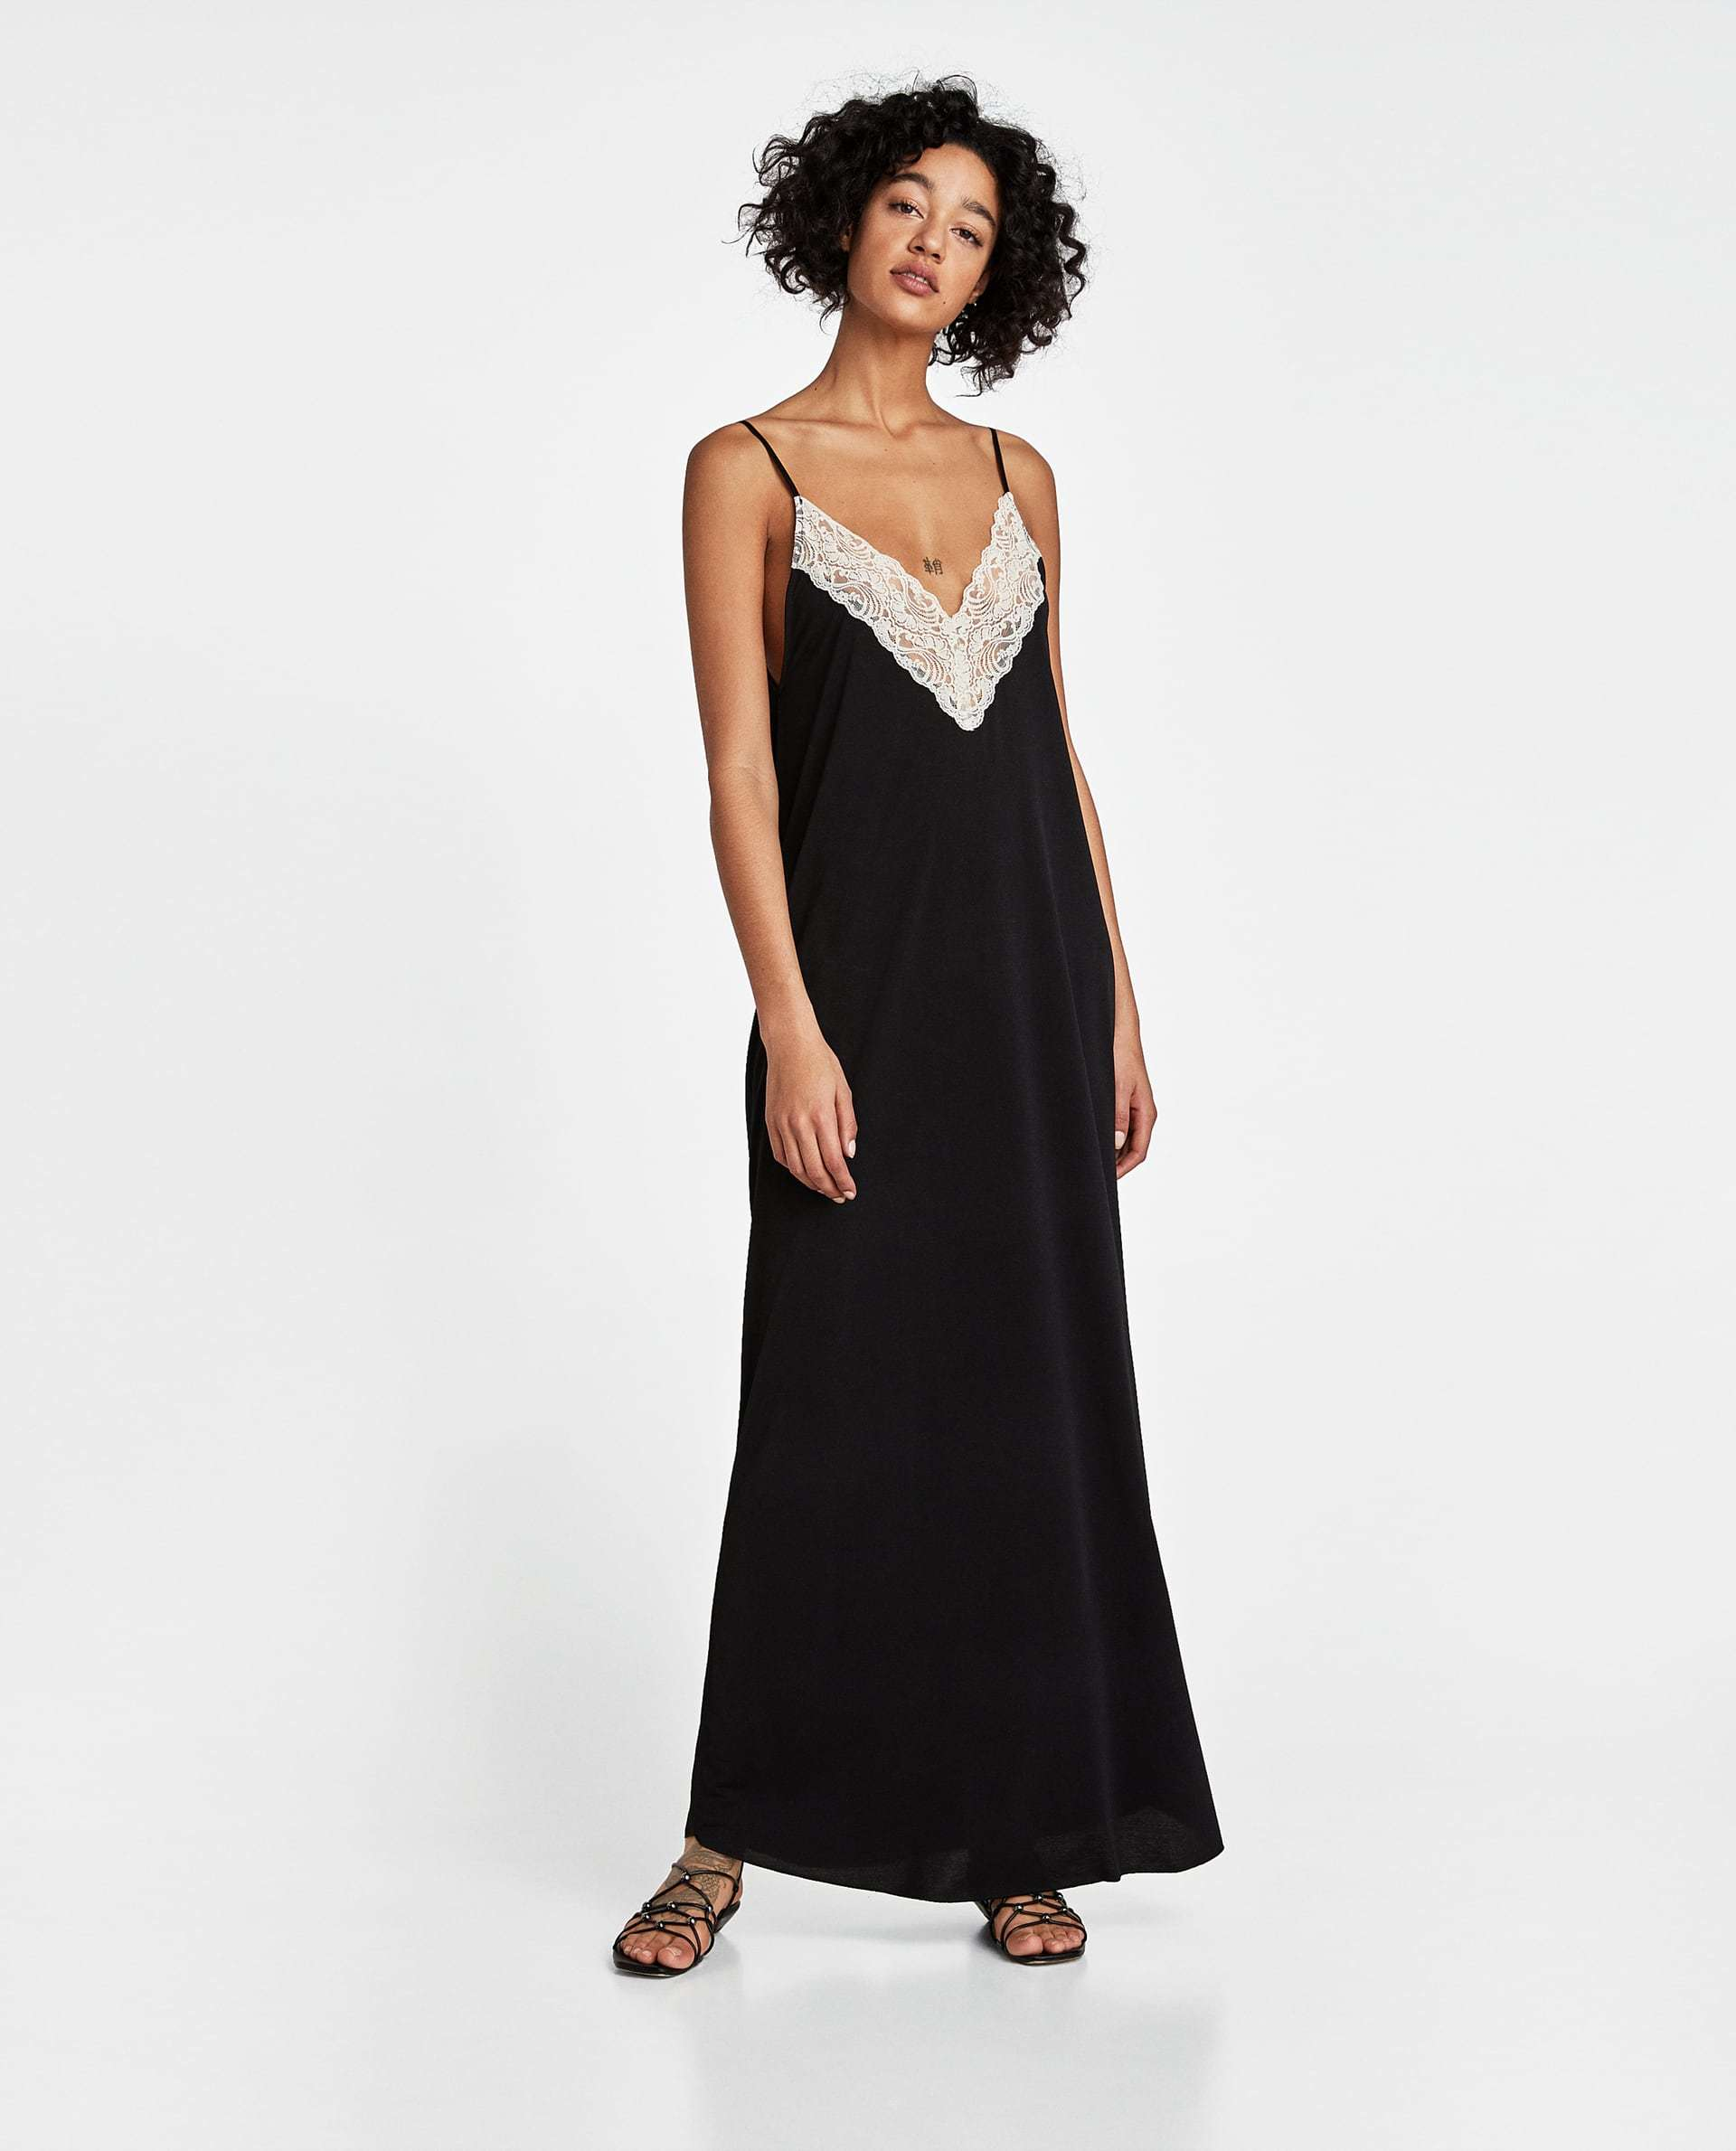 Slip dress de Zara, en raso negro (29,95 euros).